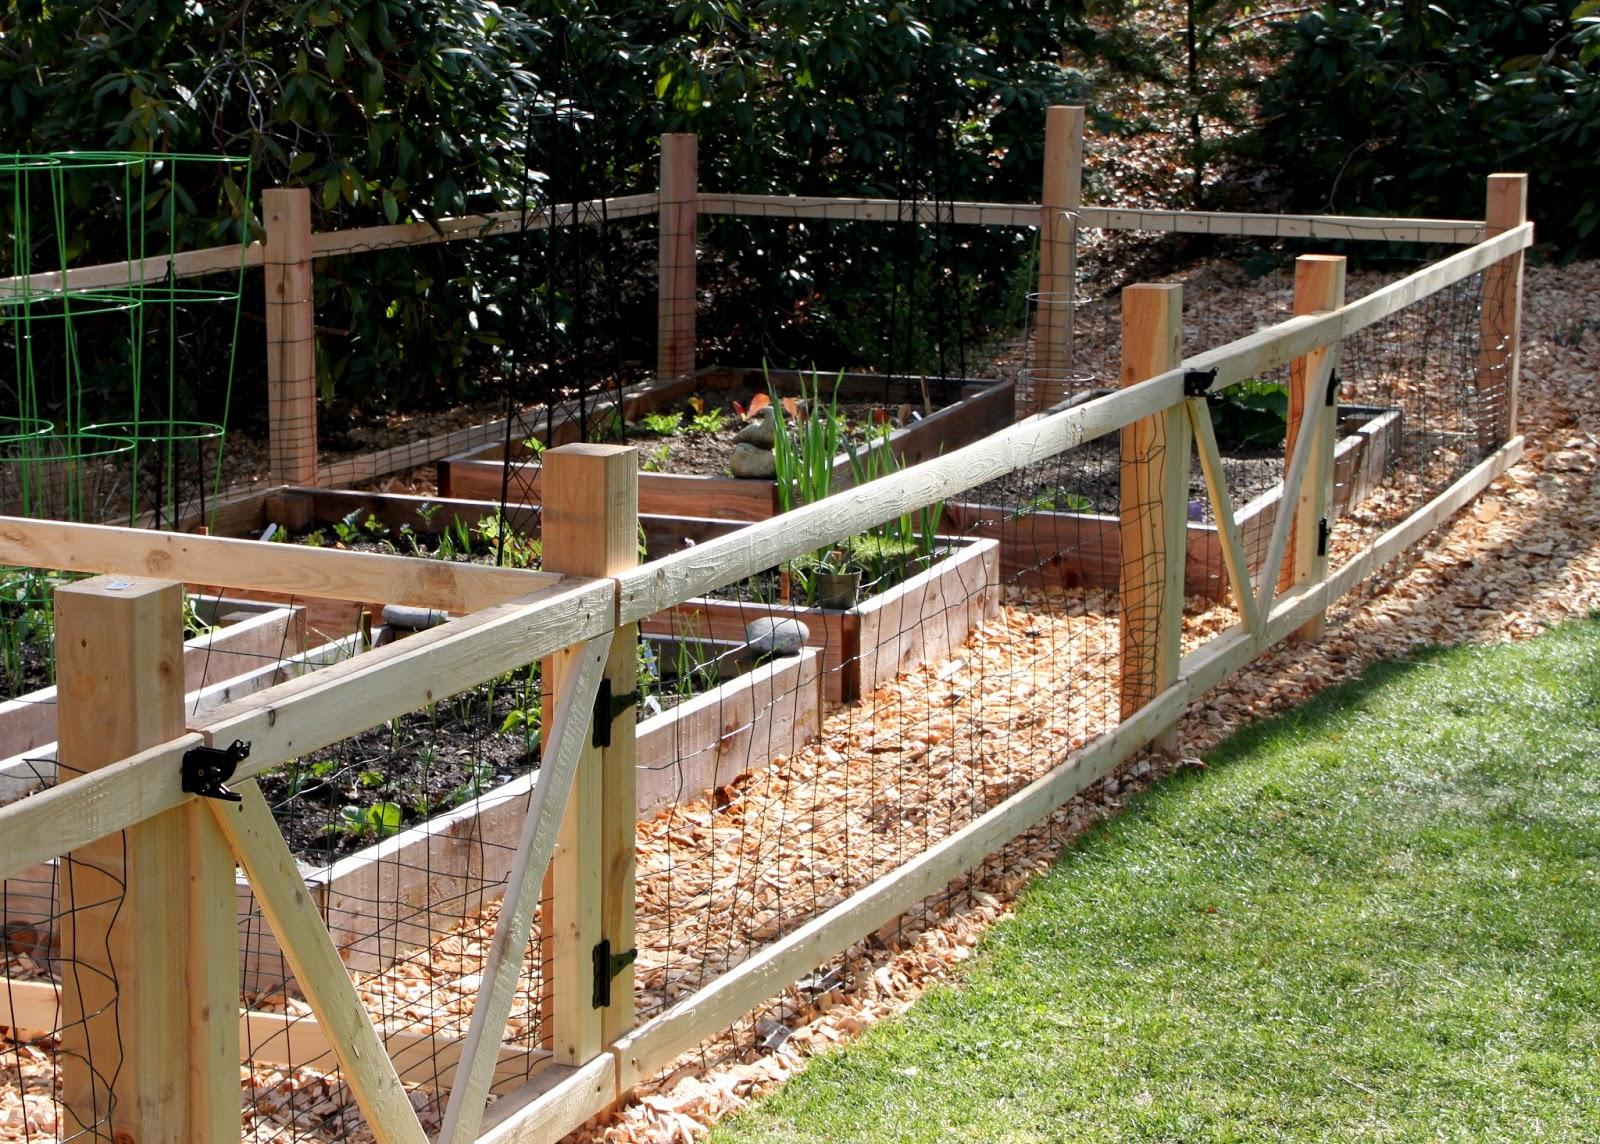 Small Garden Fencing: Tilly's Nest: A Simple Garden Fence